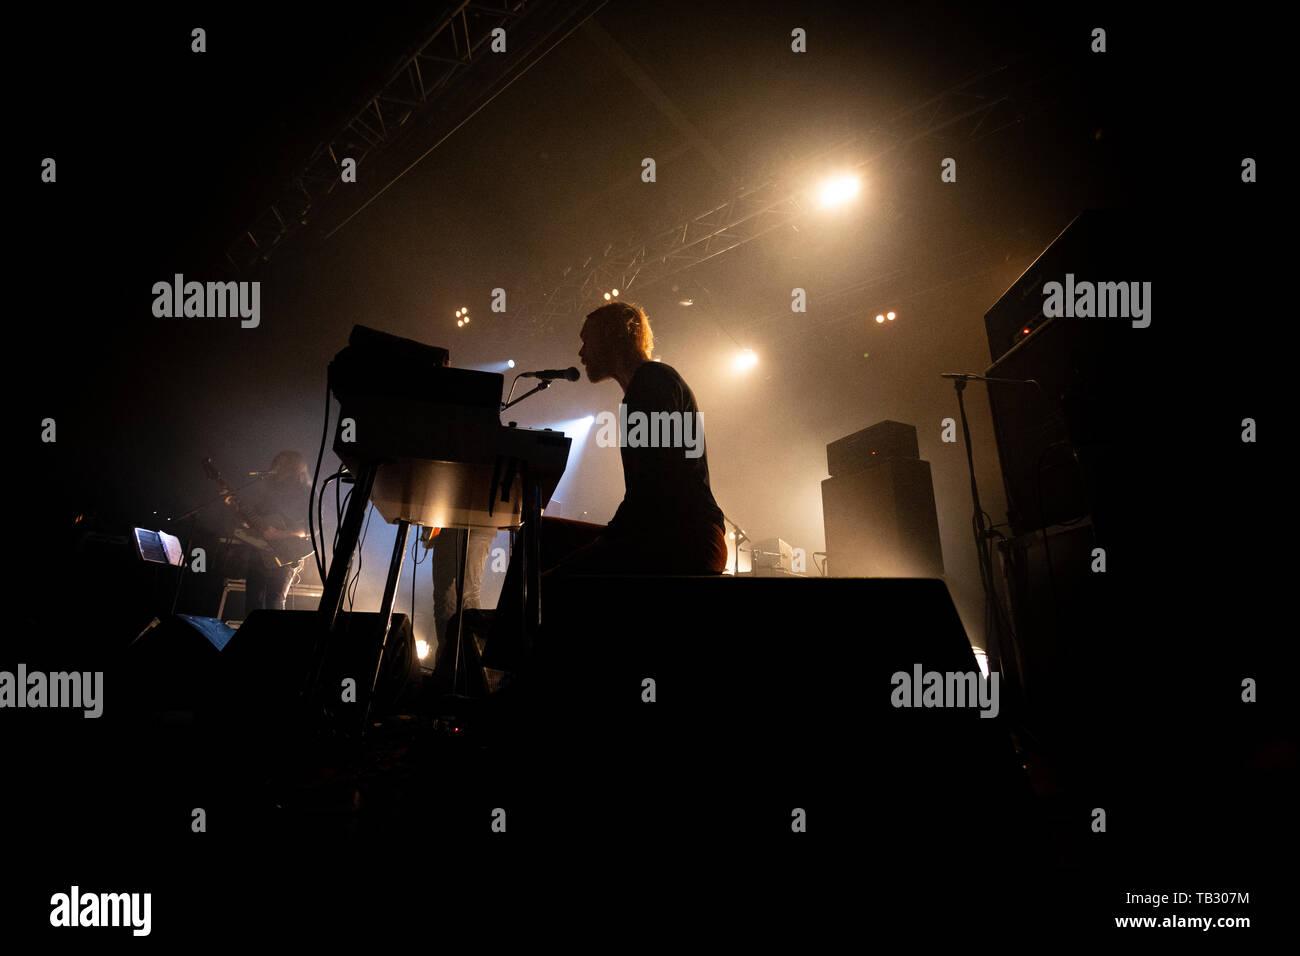 Milán, Italia el 28 de mayo de 2019 Live at Live Club Motorpsycho Trezzo sull'Adda Milan © Andrea Ripamonti / Alamy Foto de stock